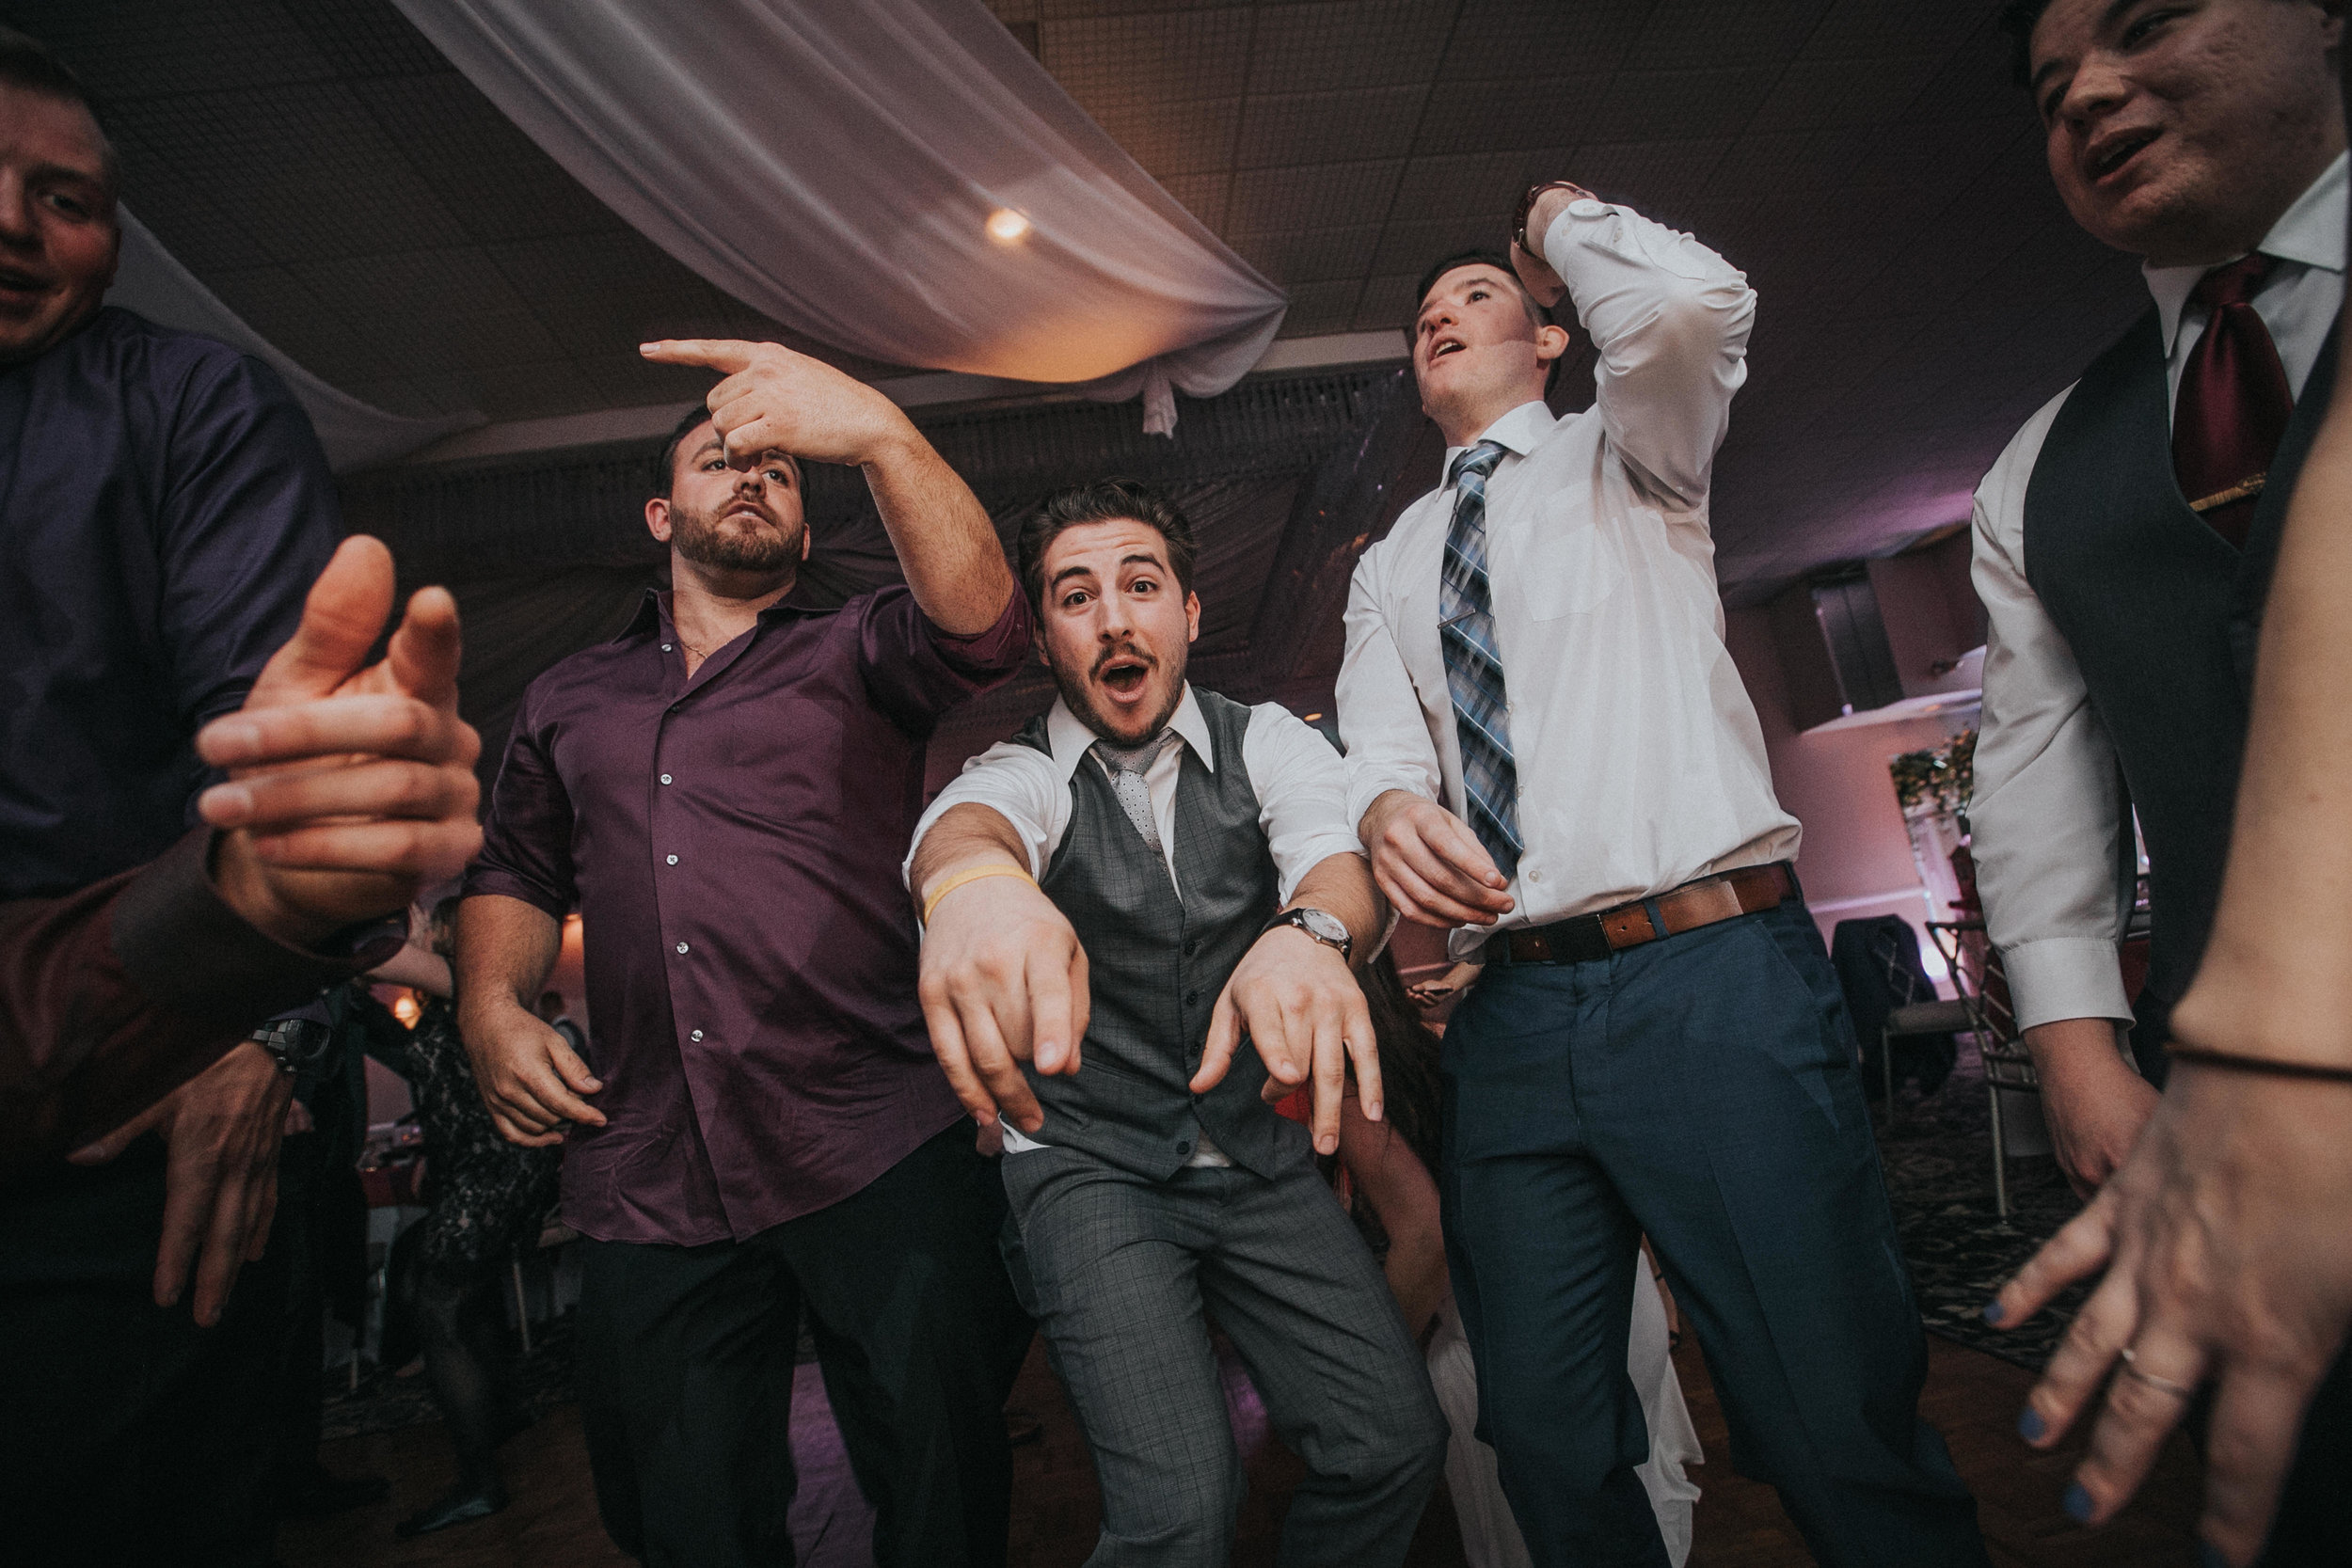 New-Jersey-Wedding-Photographer-ReceptionCenter-Valeria&Mike-Reception (226 of 265).jpg